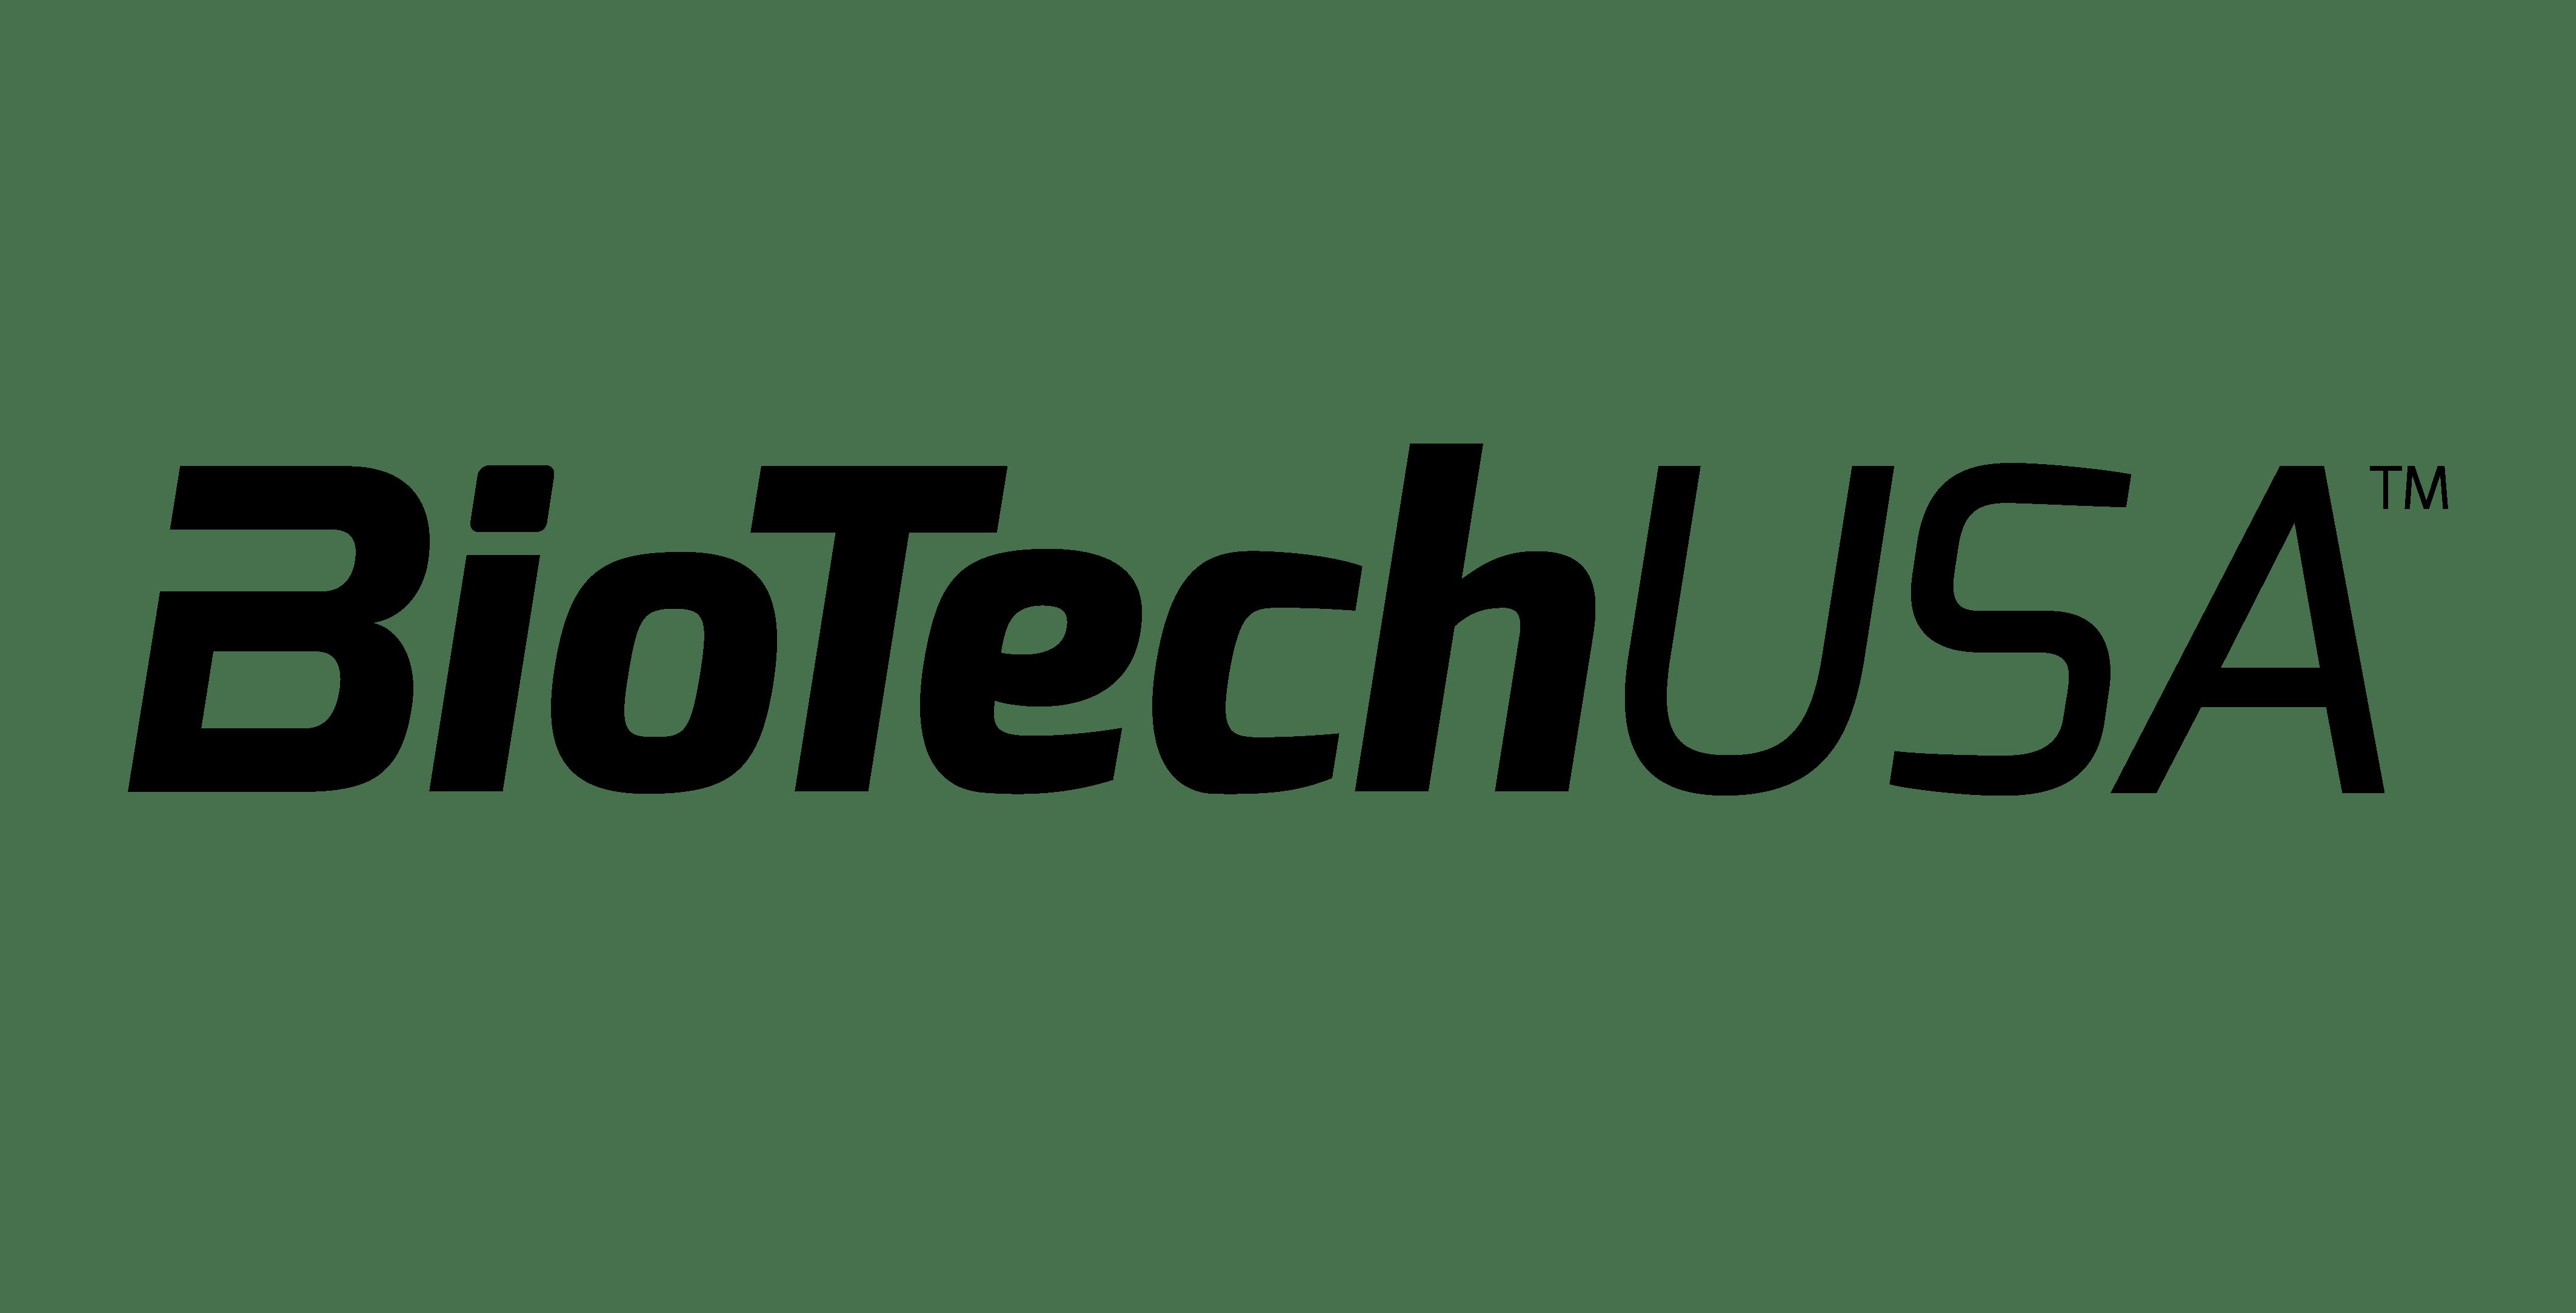 BioTechUSA